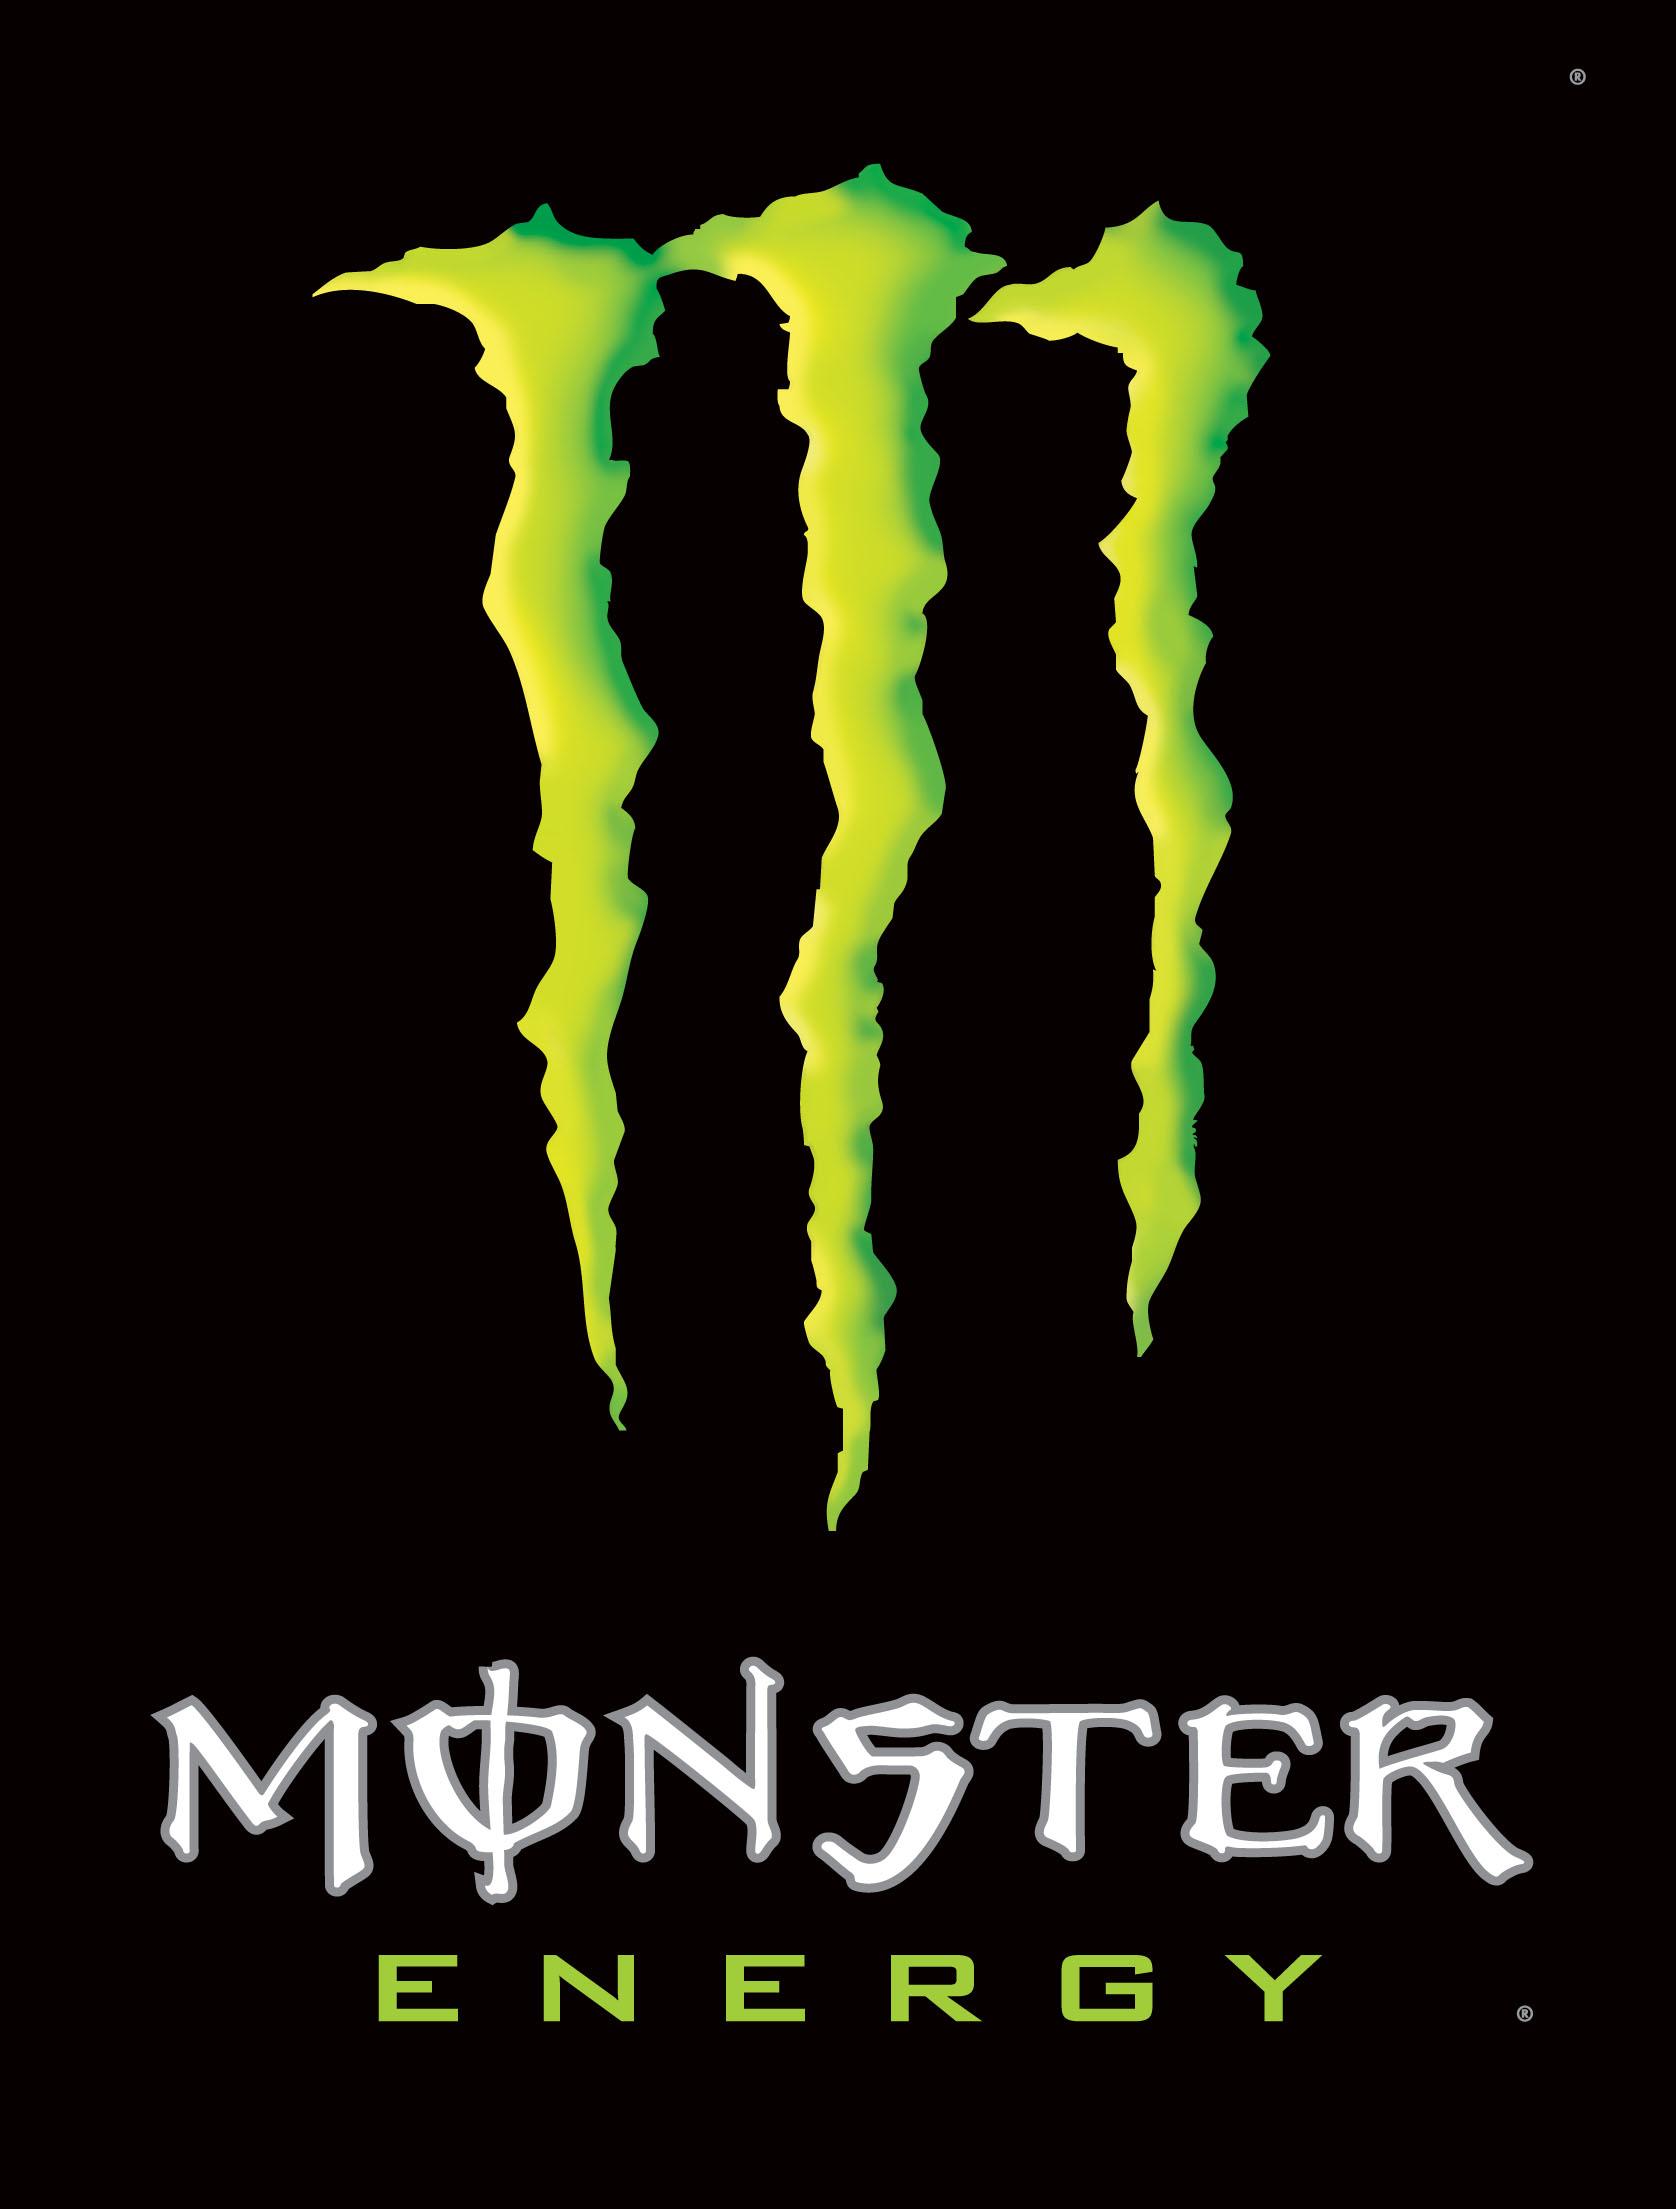 Monster Logo Wallpaper 6483 Hd Wallpapers in Logos   Imagescicom 1676x2209